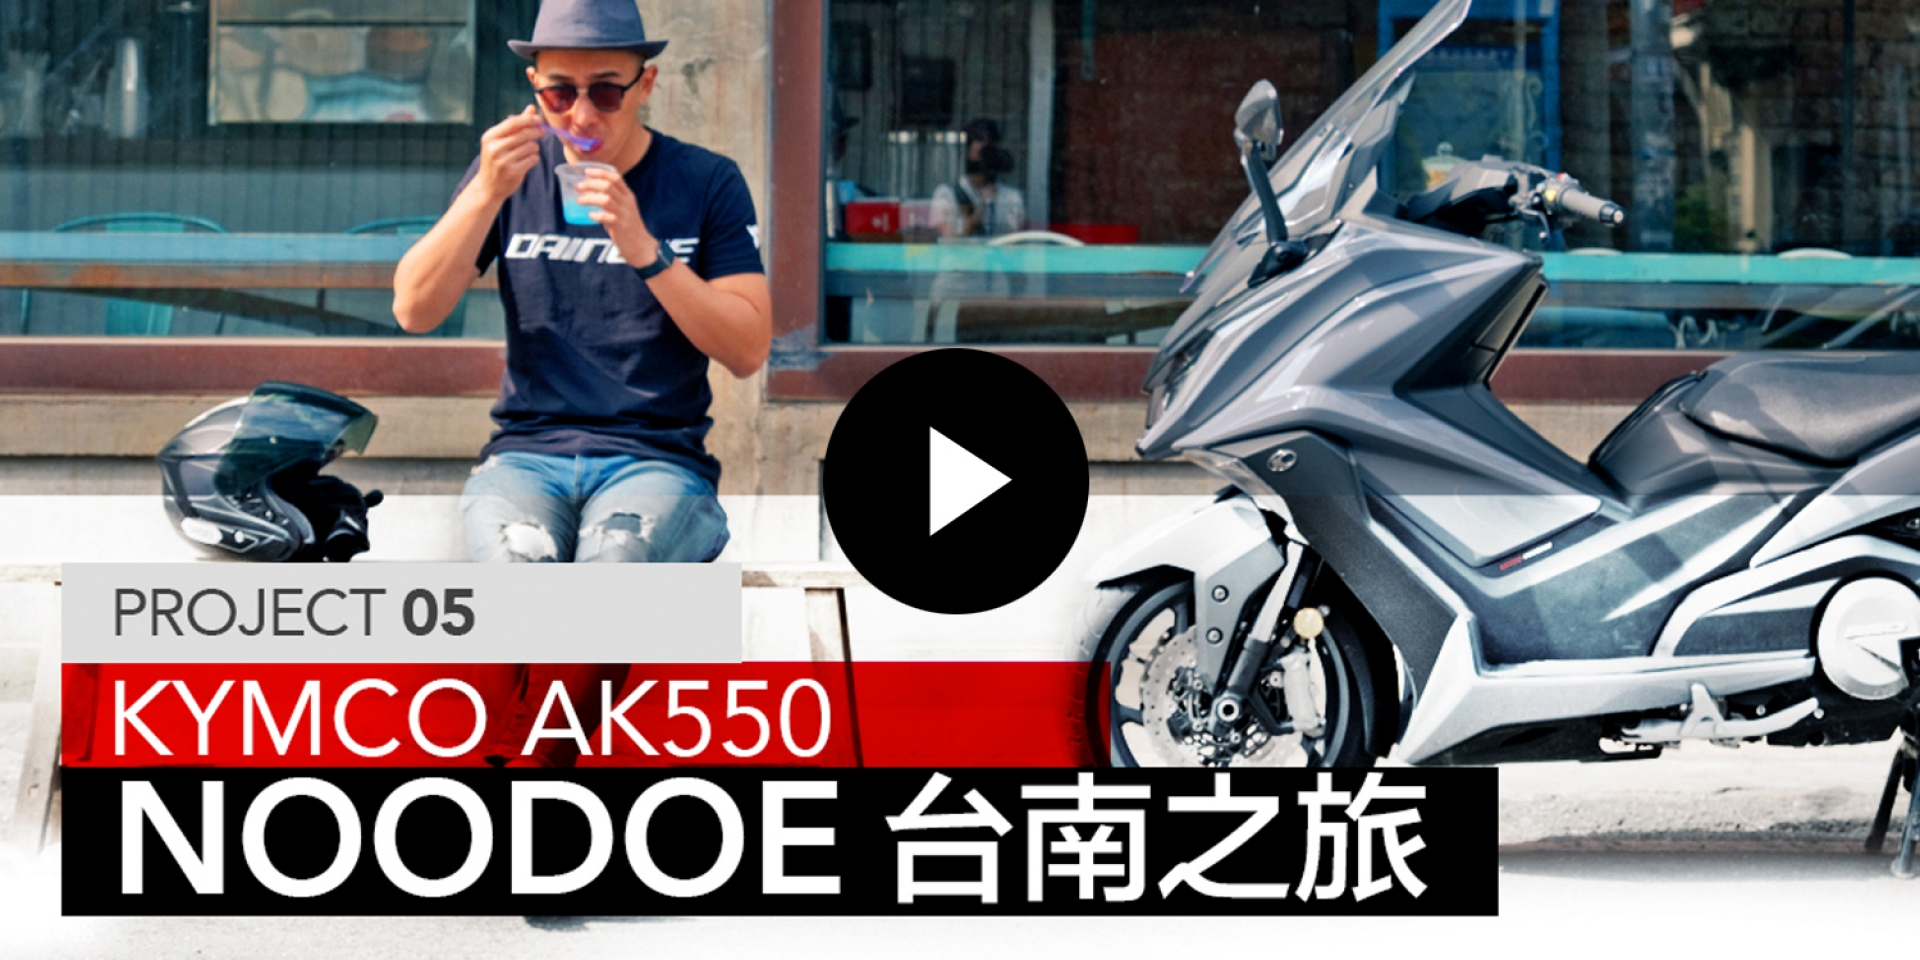 KYMCO AK550 NOODOE台南之旅 / PROJECT 05